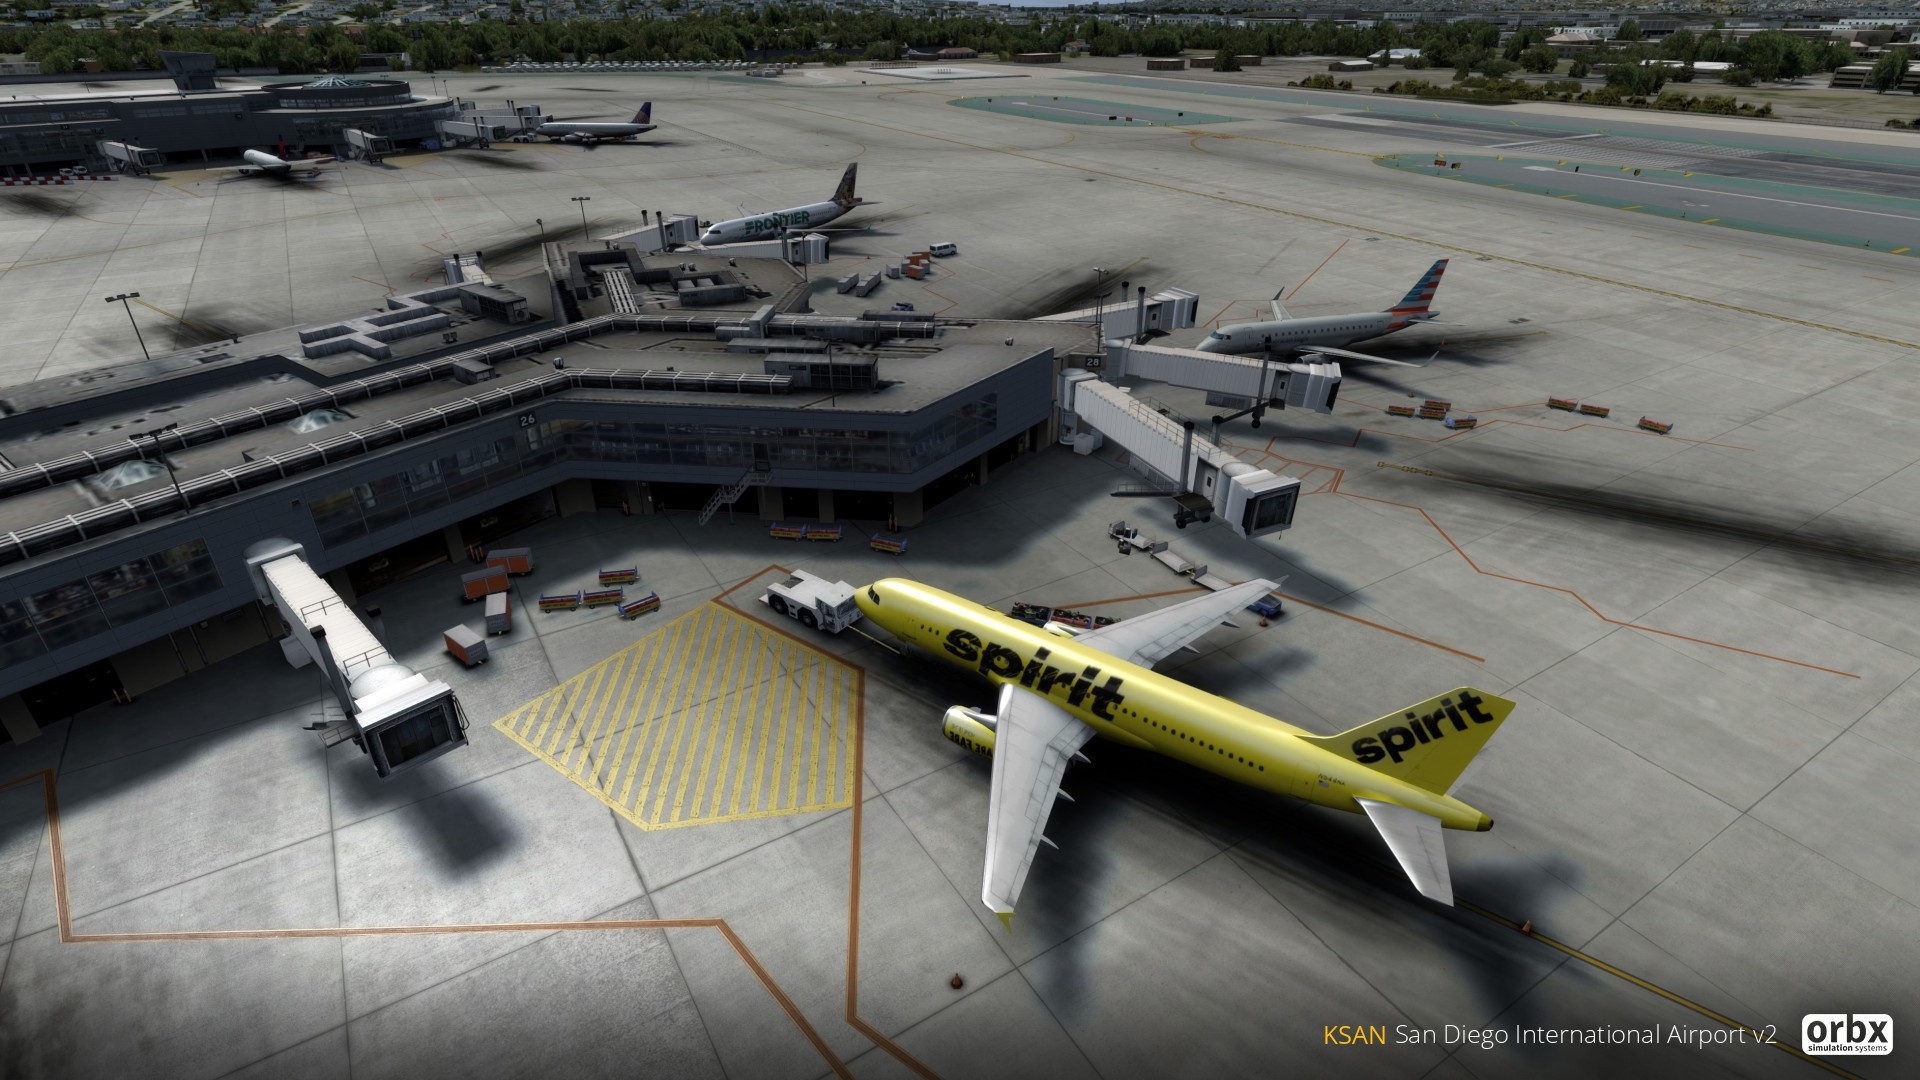 KSAN San Diego International Airport